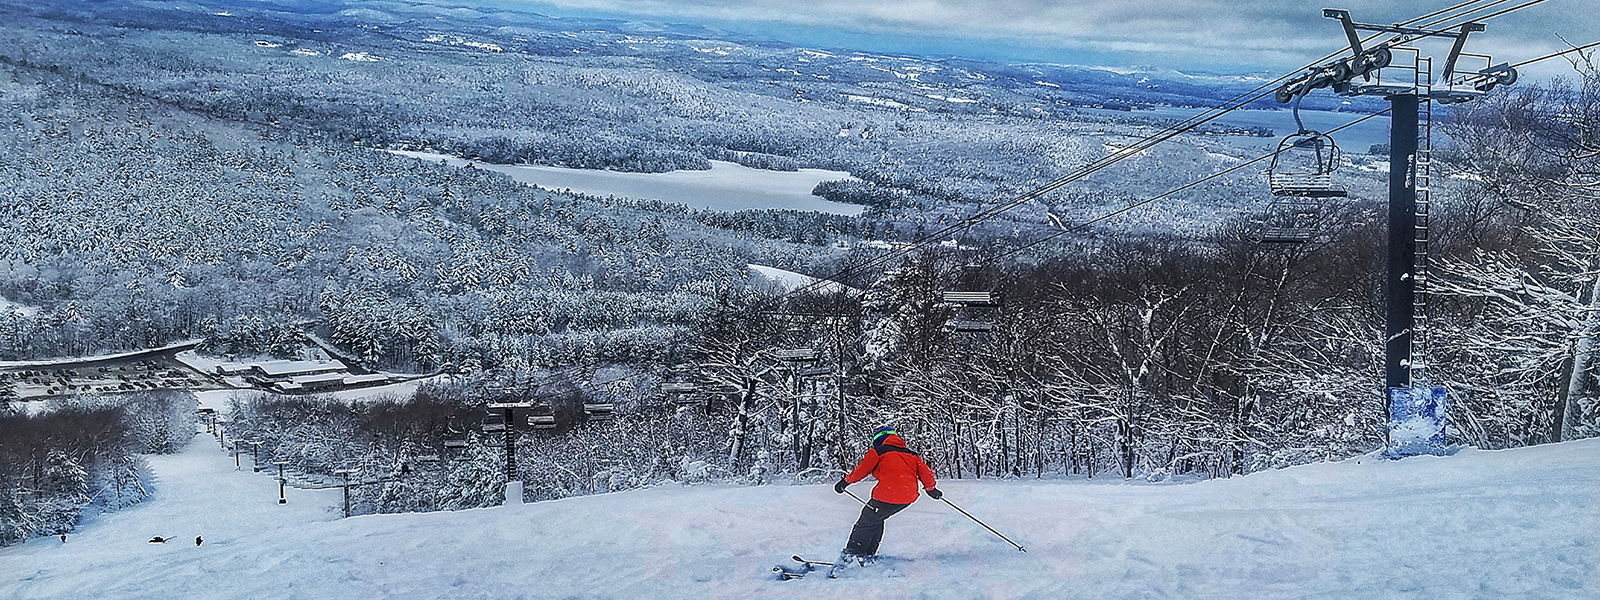 Skiing and Winter Activities: Follansbee Inn, North Sutton, NH B&B